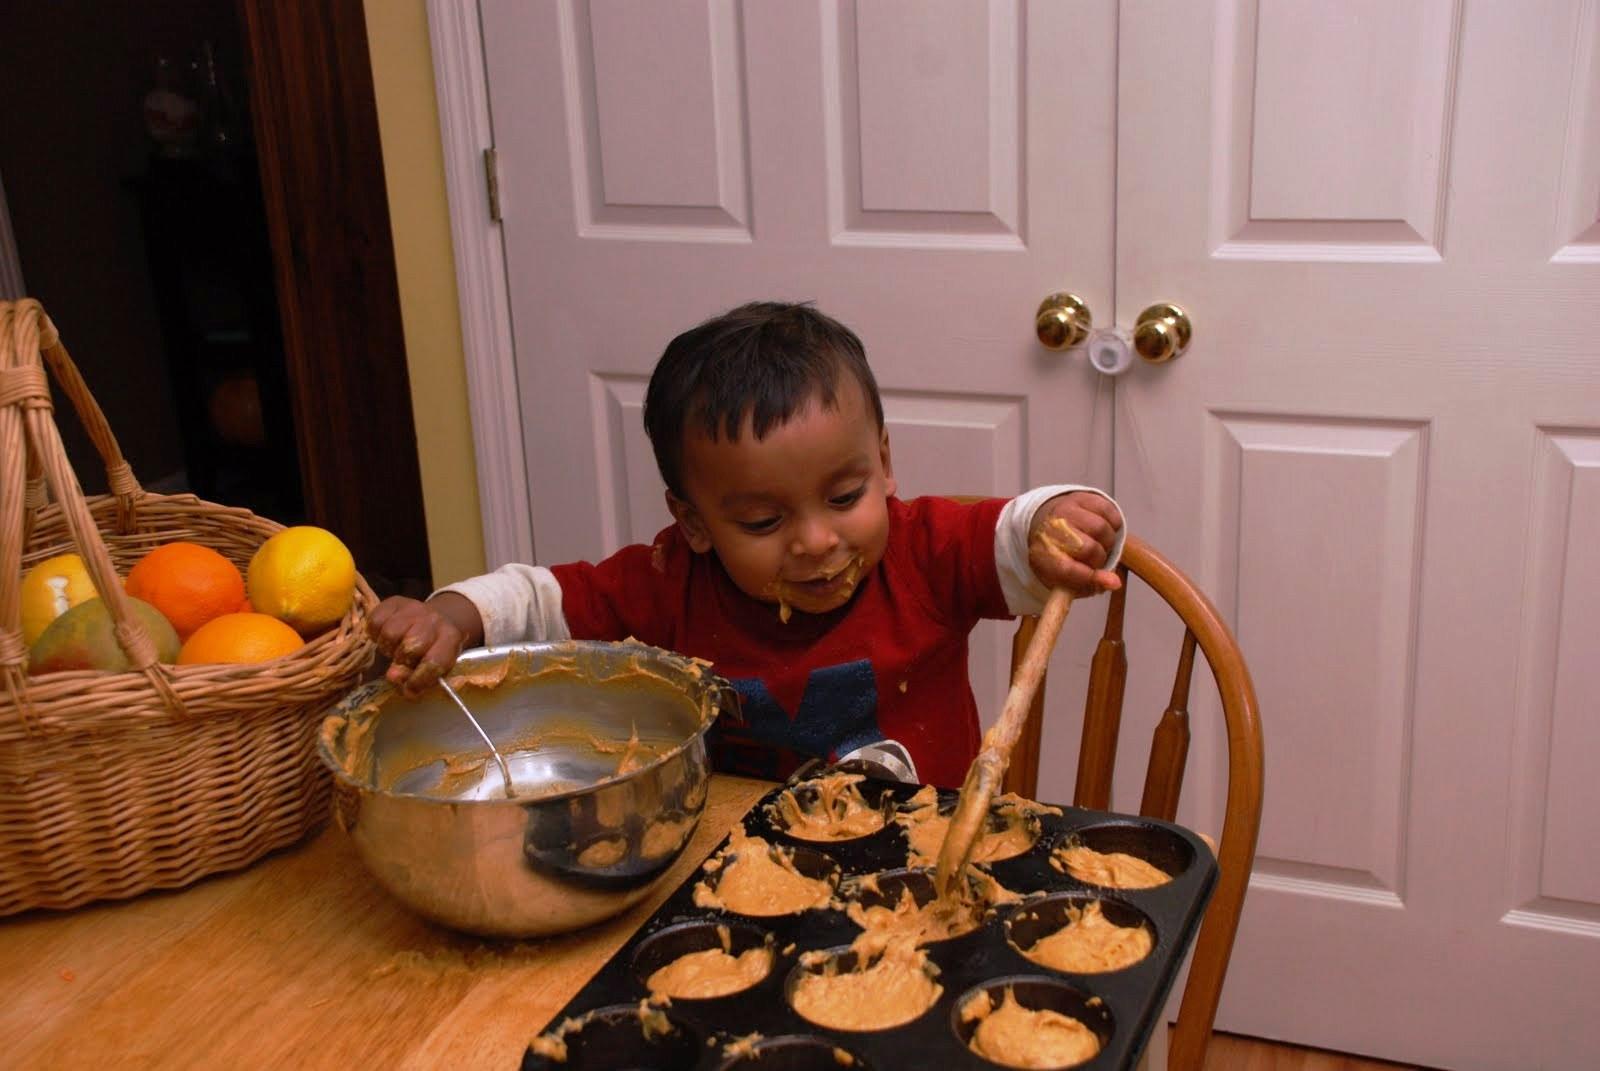 Manu at the kitchen table